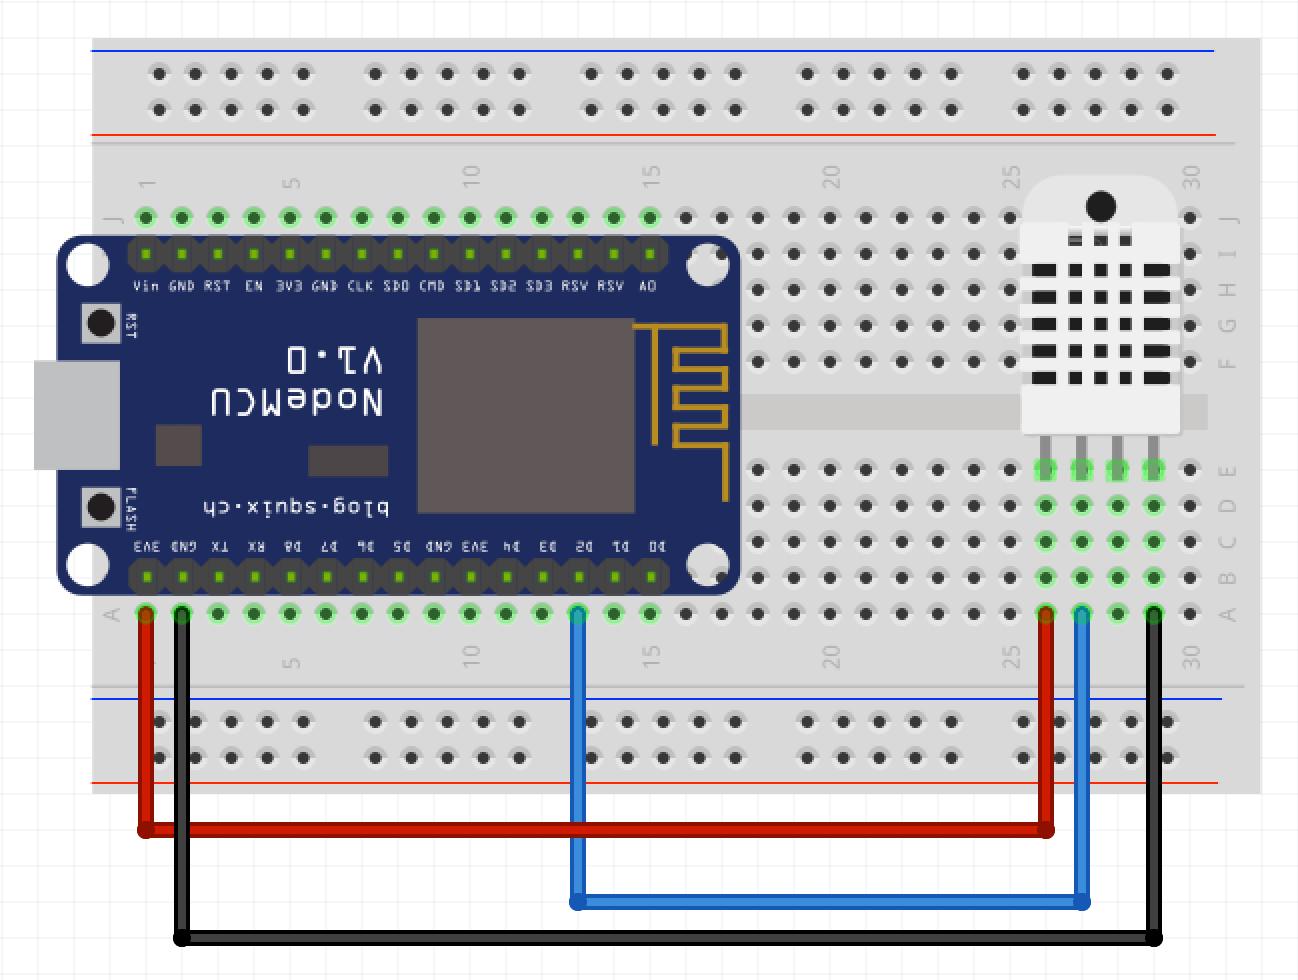 dht22 esp8266 wiring png [ 1298 x 980 Pixel ]